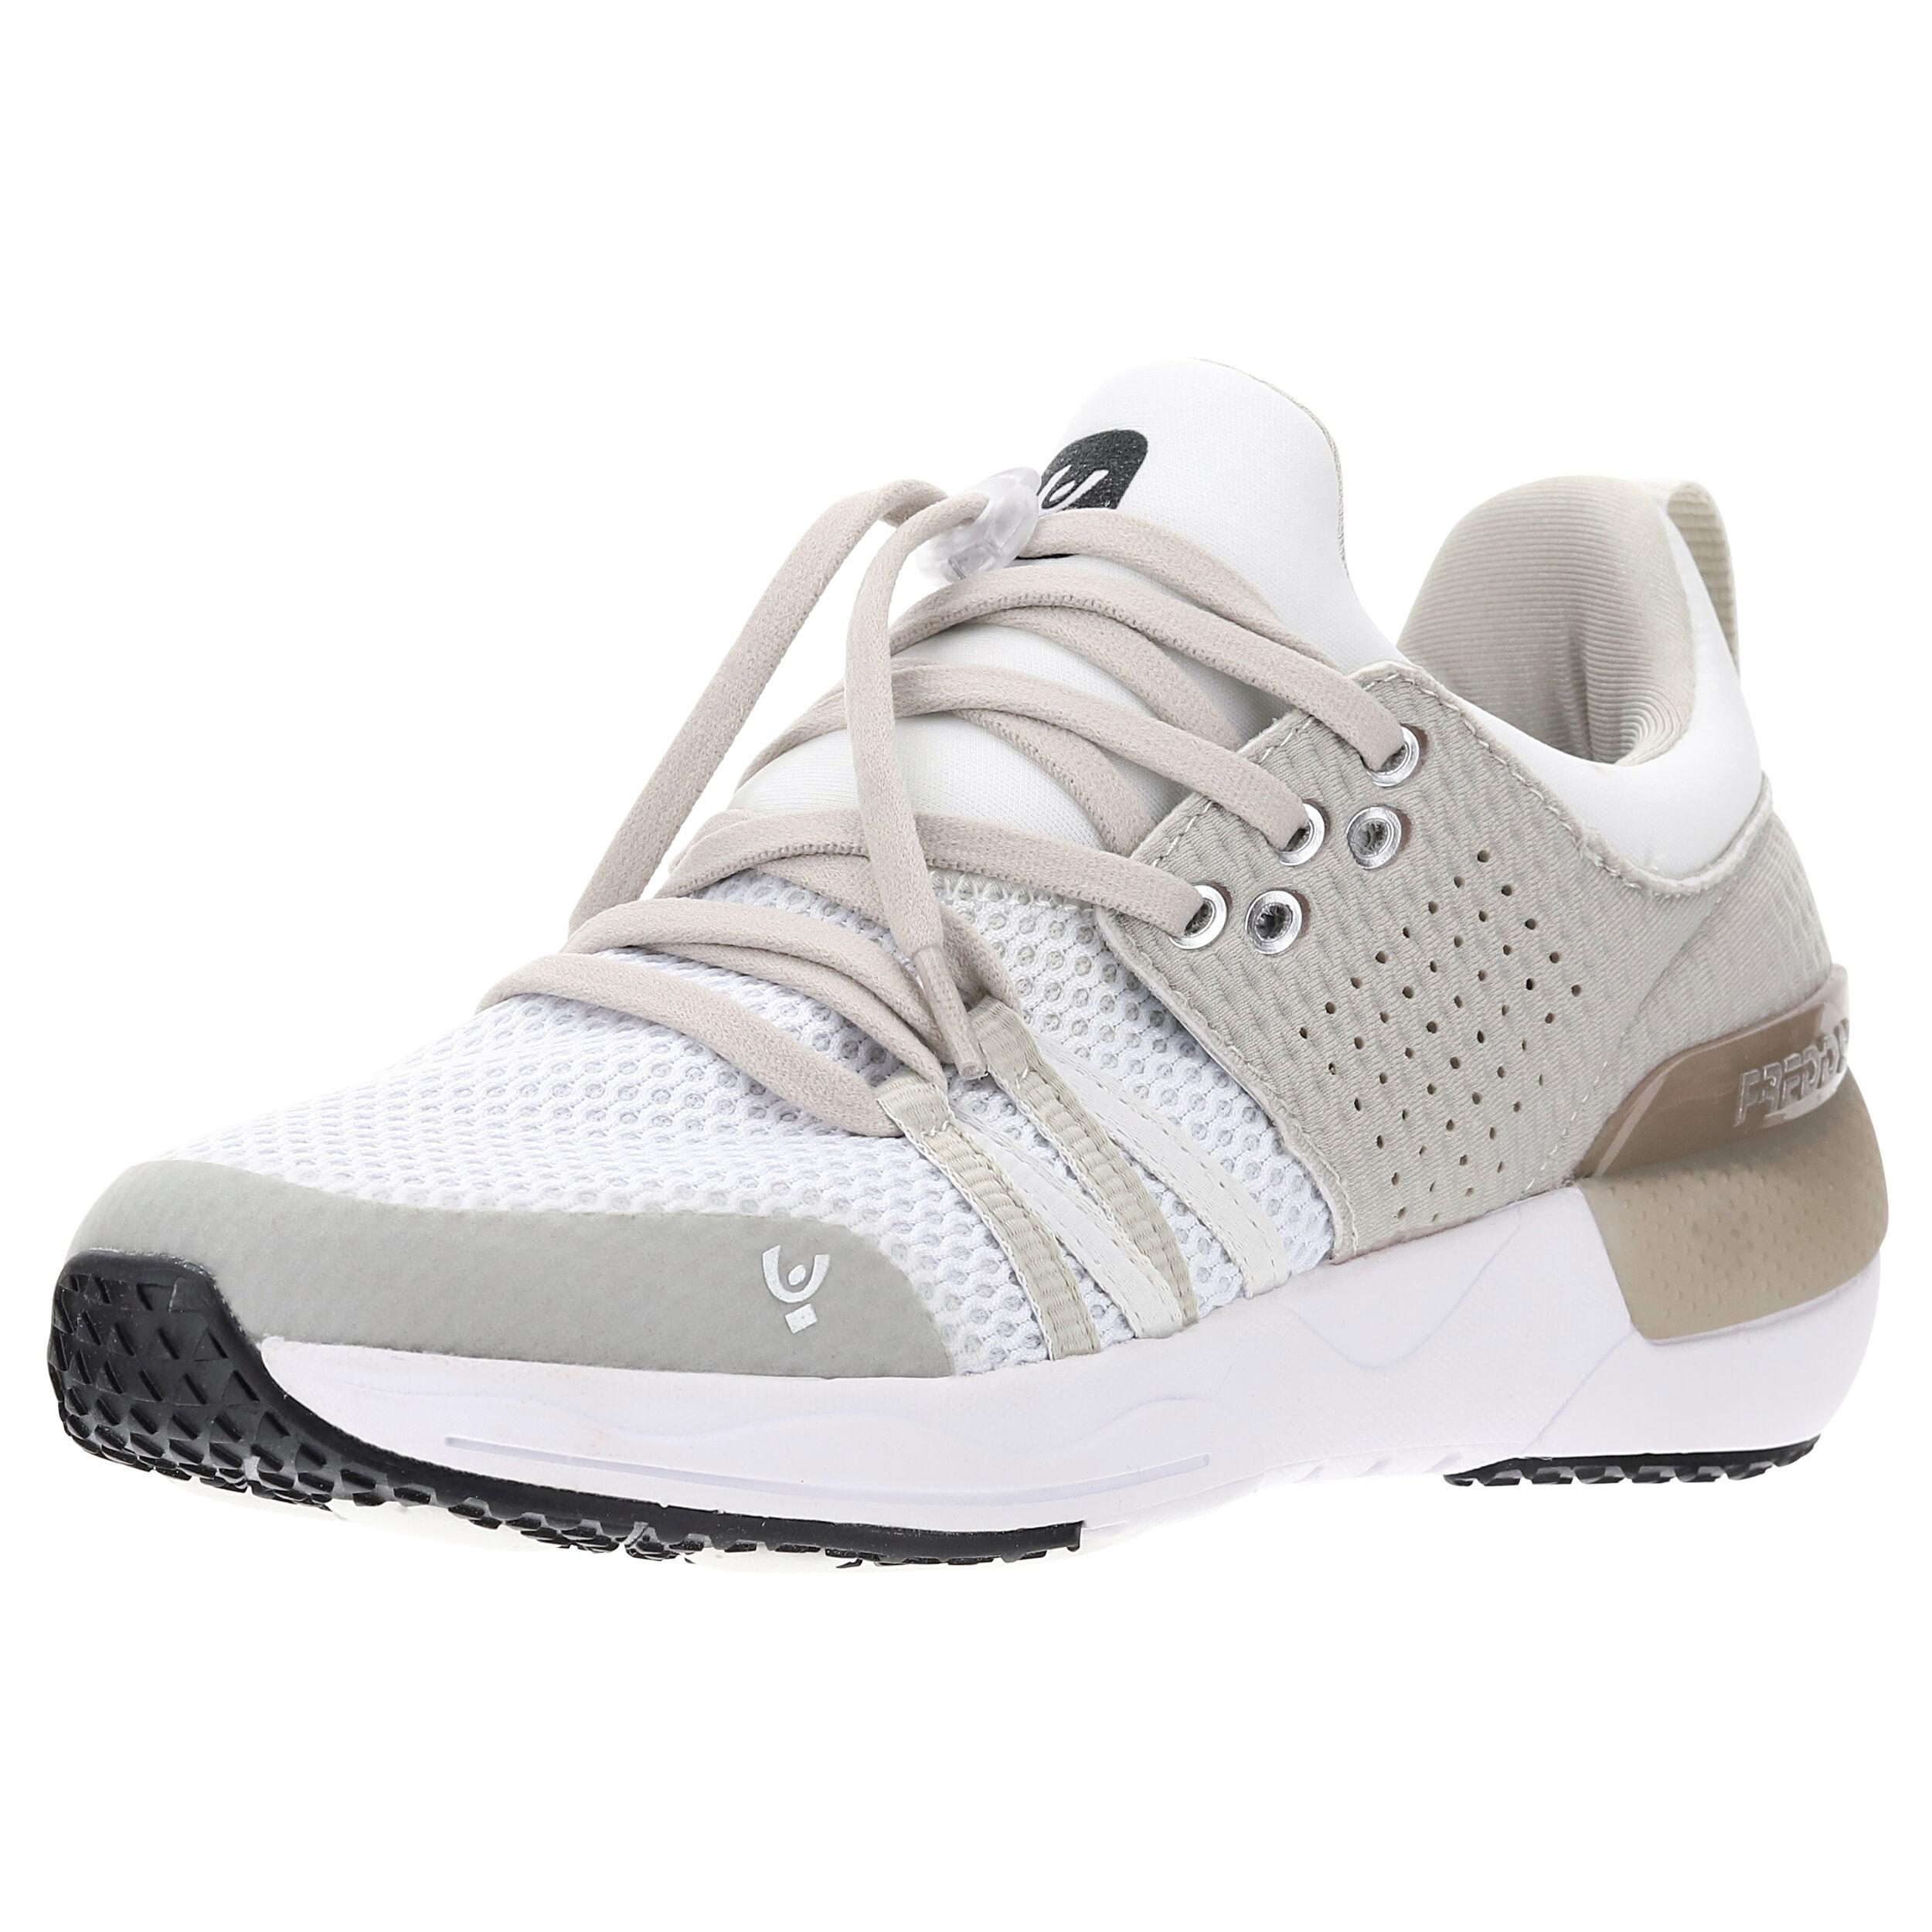 Freddy Feline Skinair scarpa fitness traspirazione attiva bianca-nera White